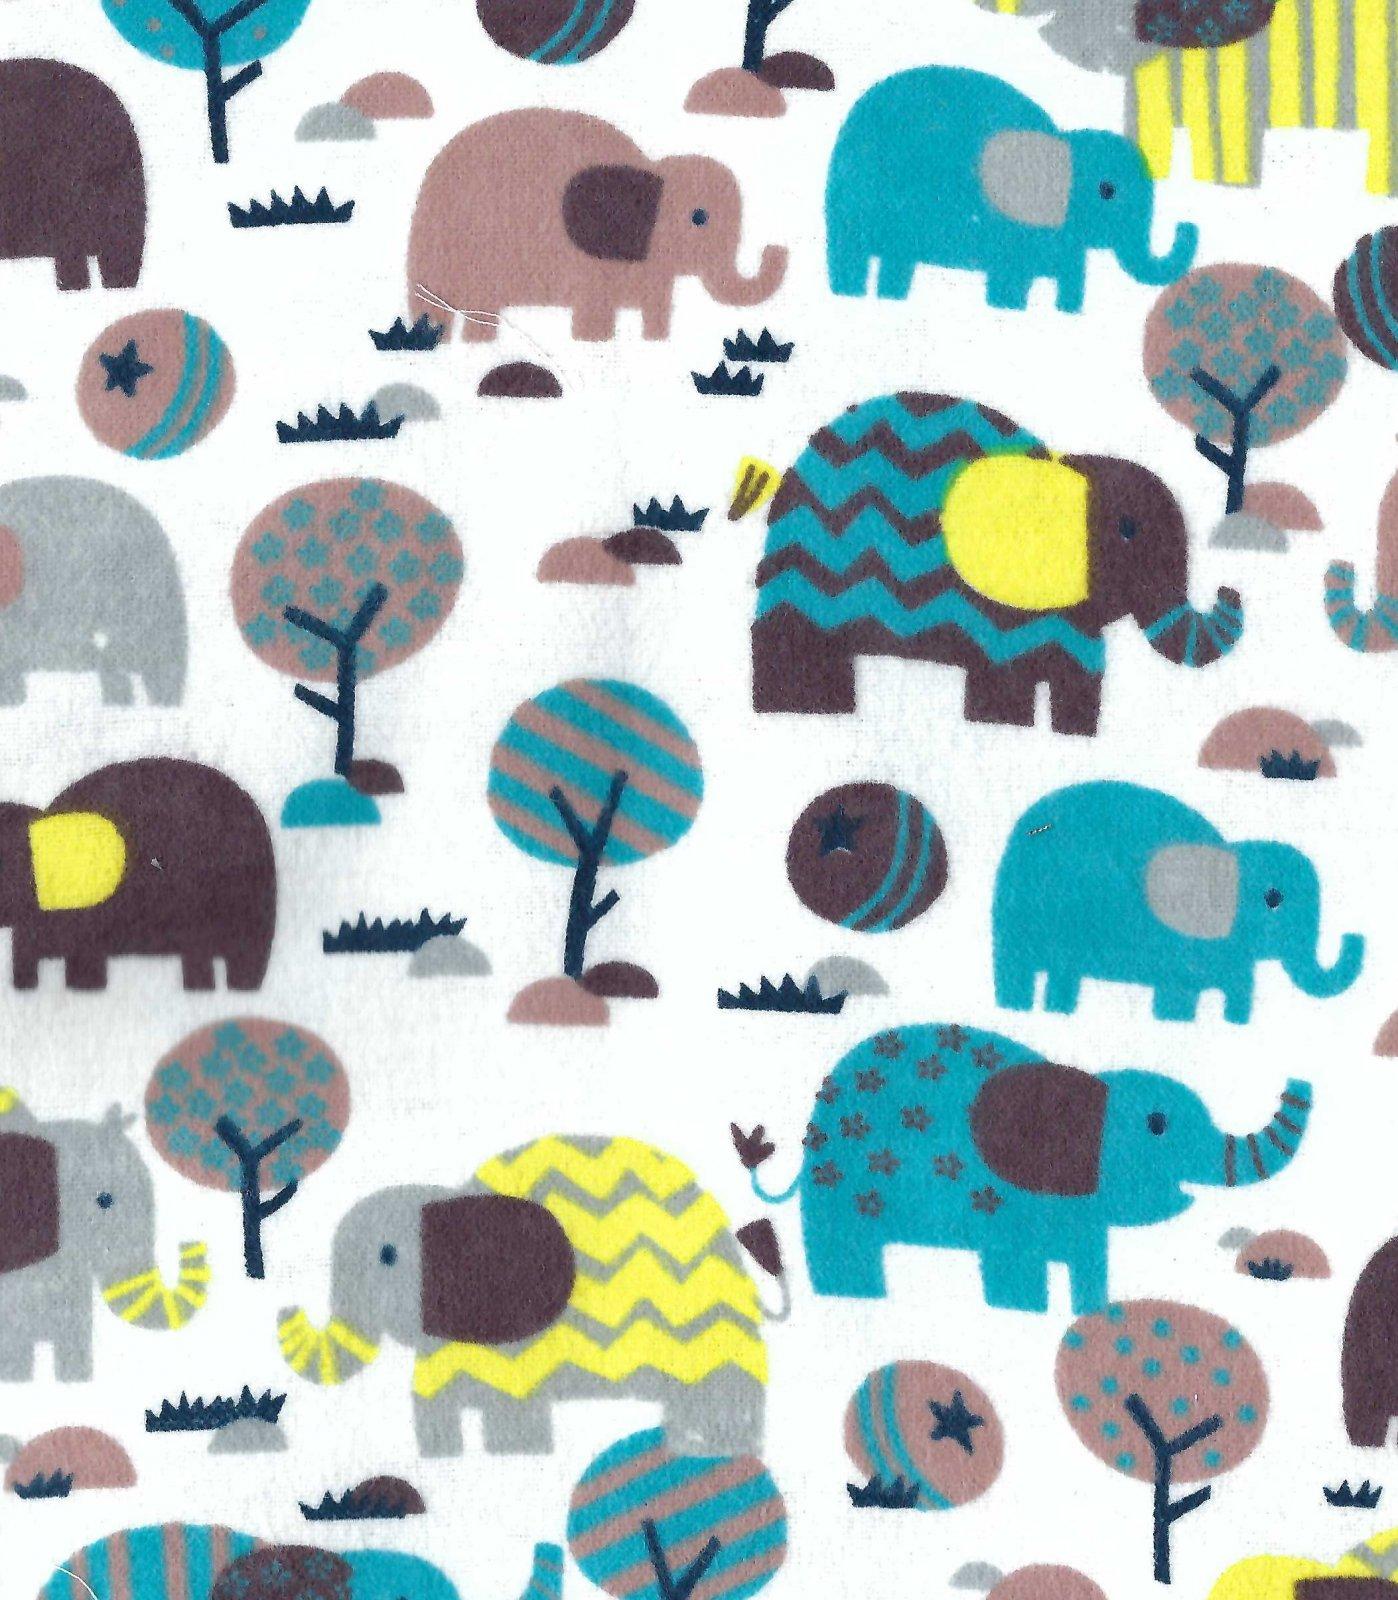 Flannel Hemstitched - Elephants